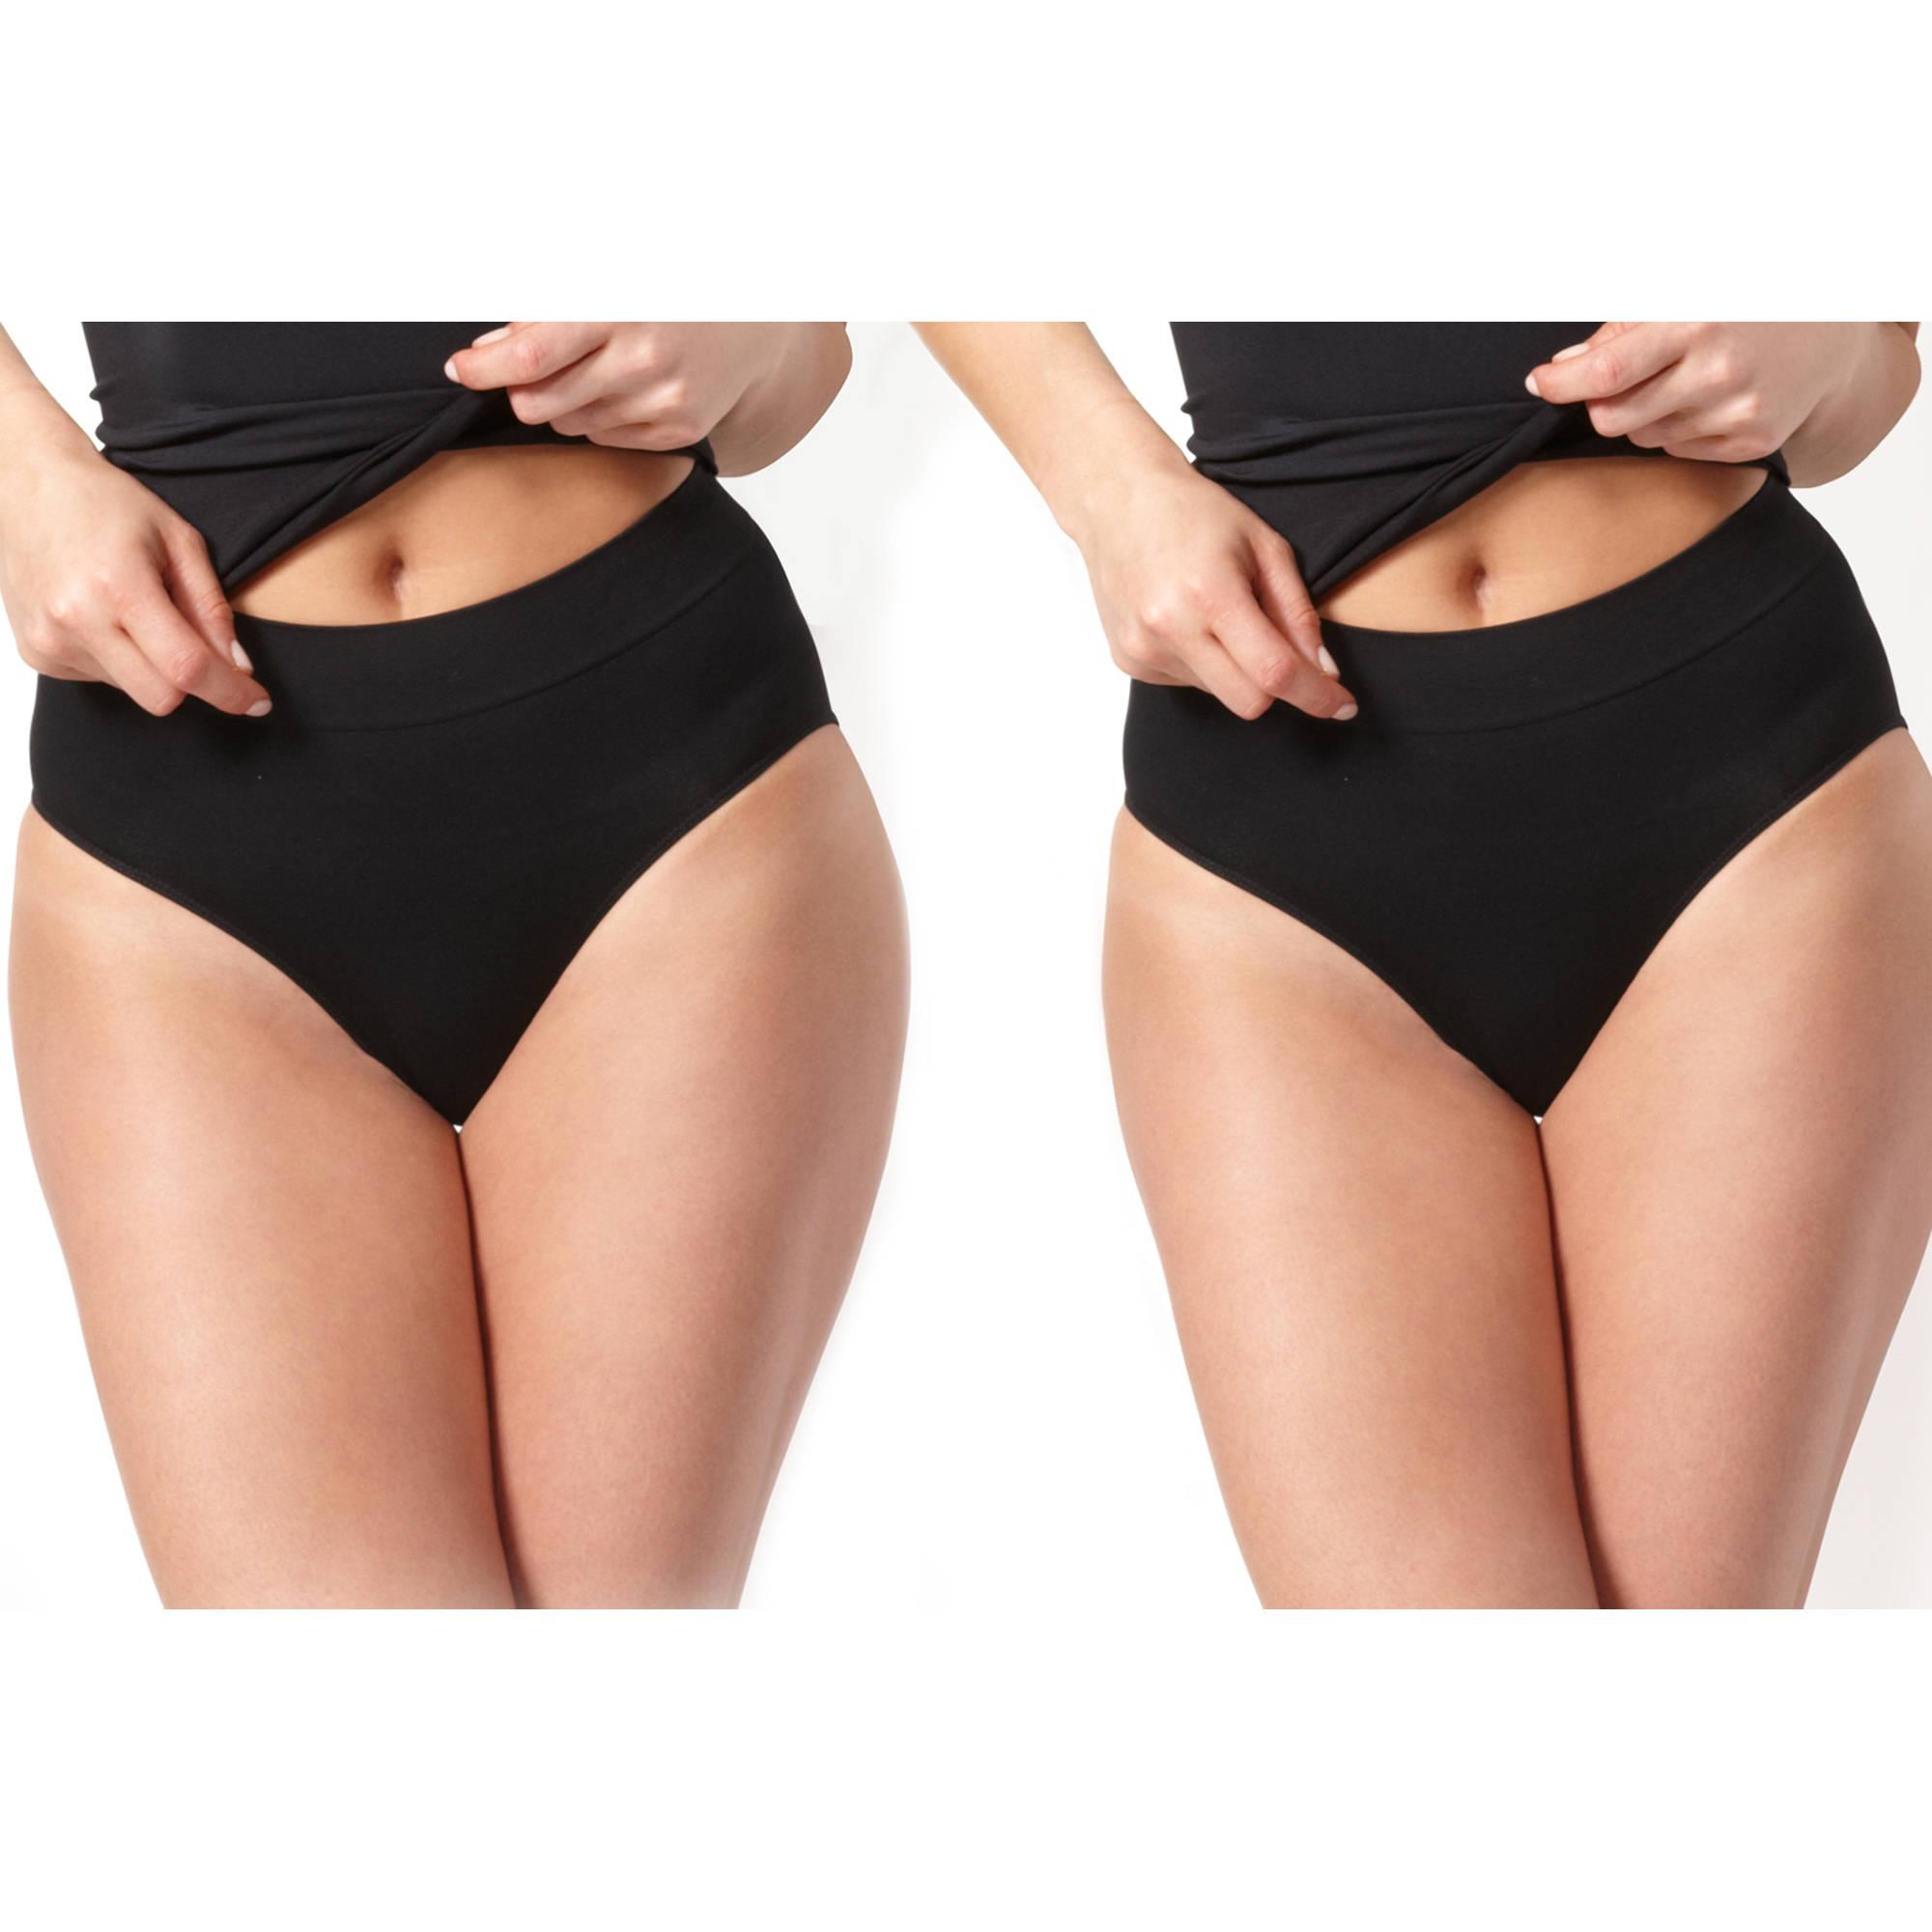 Smart & Sexy Women's Shapewear, 2pk Control Panty, Style SA496